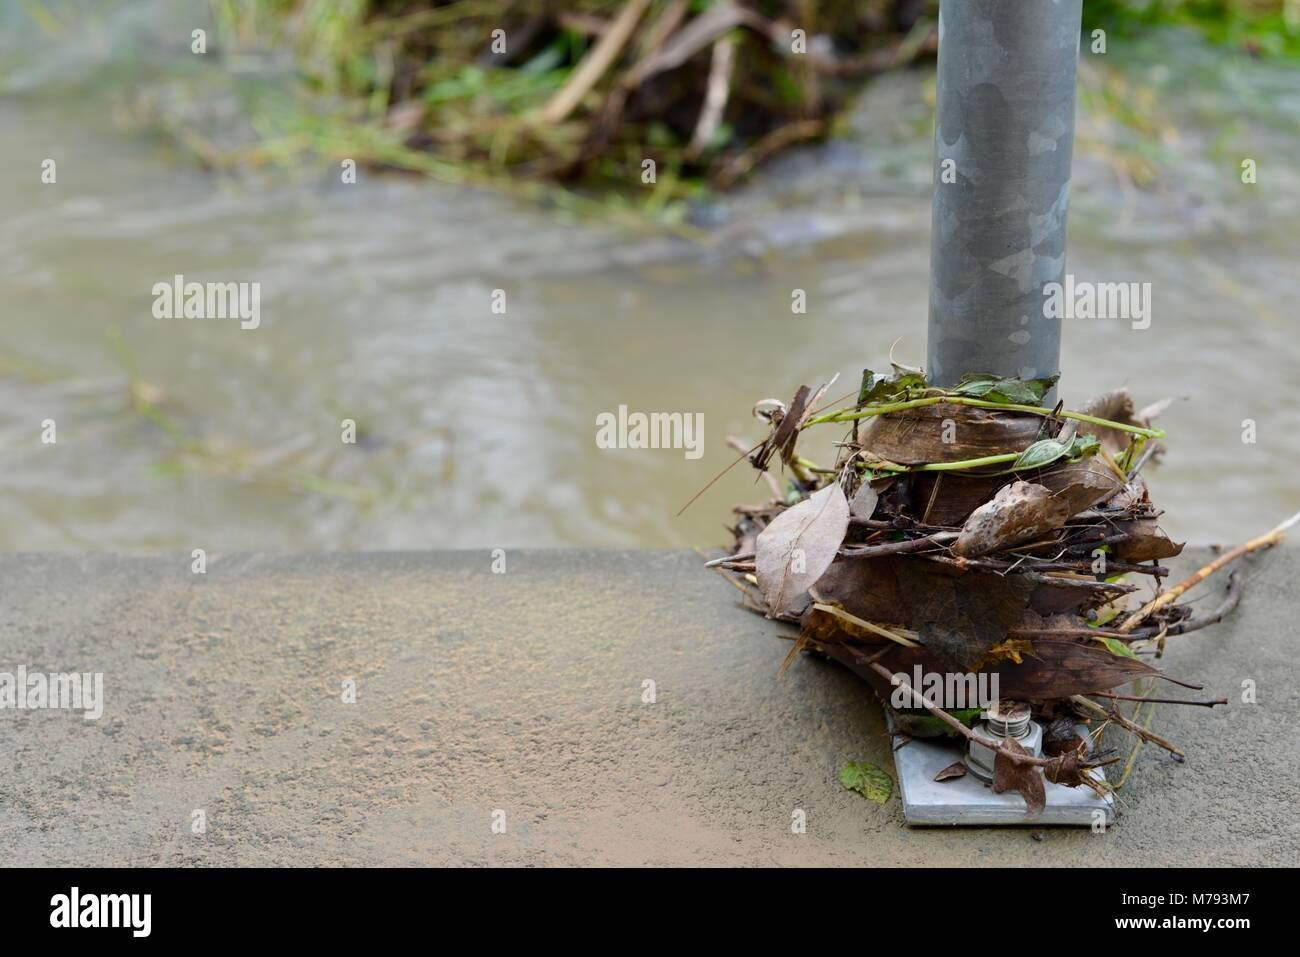 Debris lies over a pedestrian path after storms and heavy rainfall and flooding, near Aplins weir, Townsville, Queensland, - Stock Image